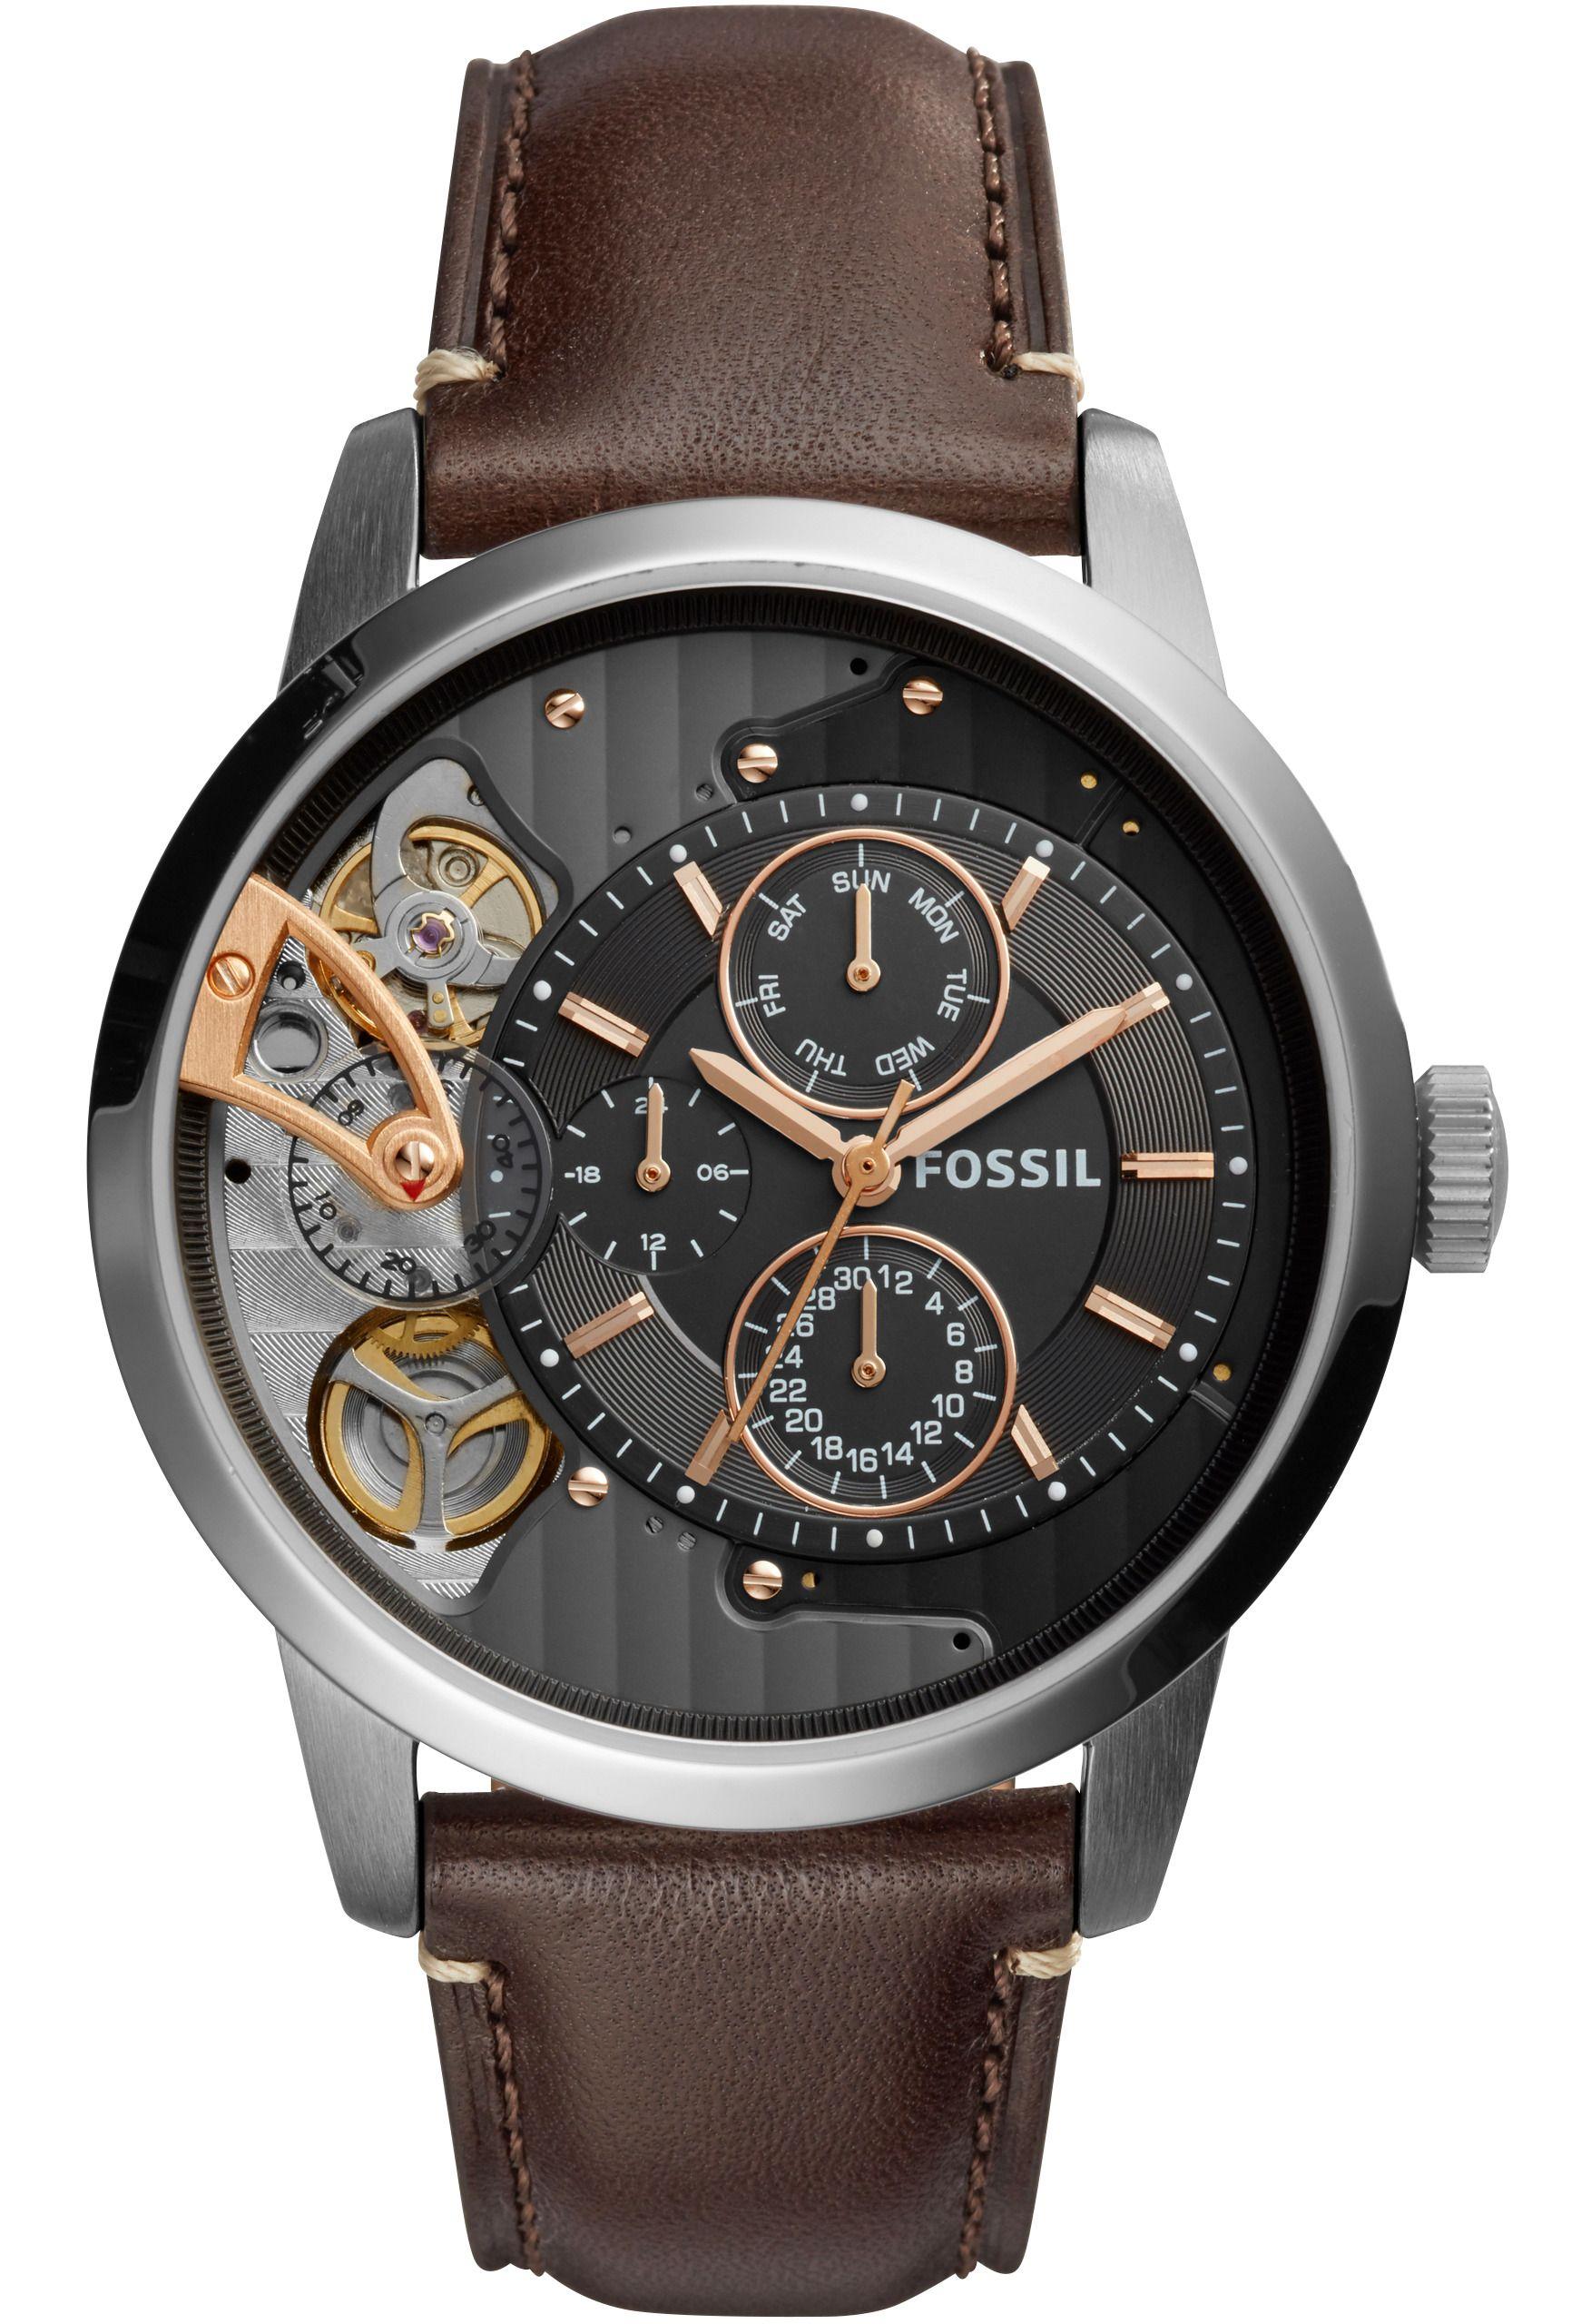 fossil montre squelette